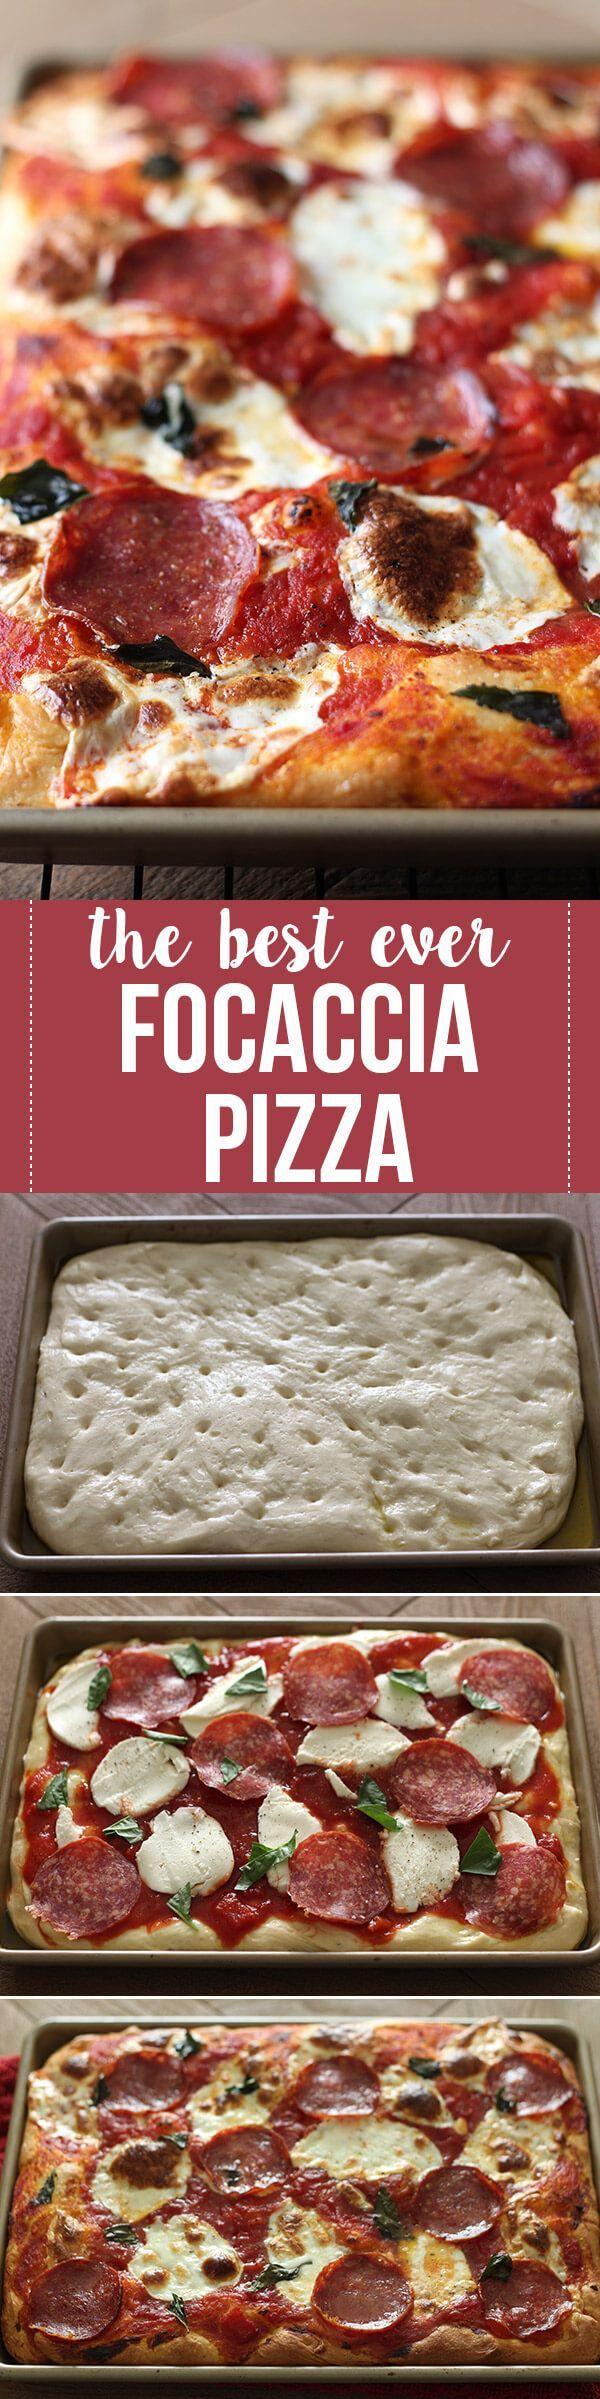 BEST EVER Focaccia Pizza!                                                                                                                                                                                 More